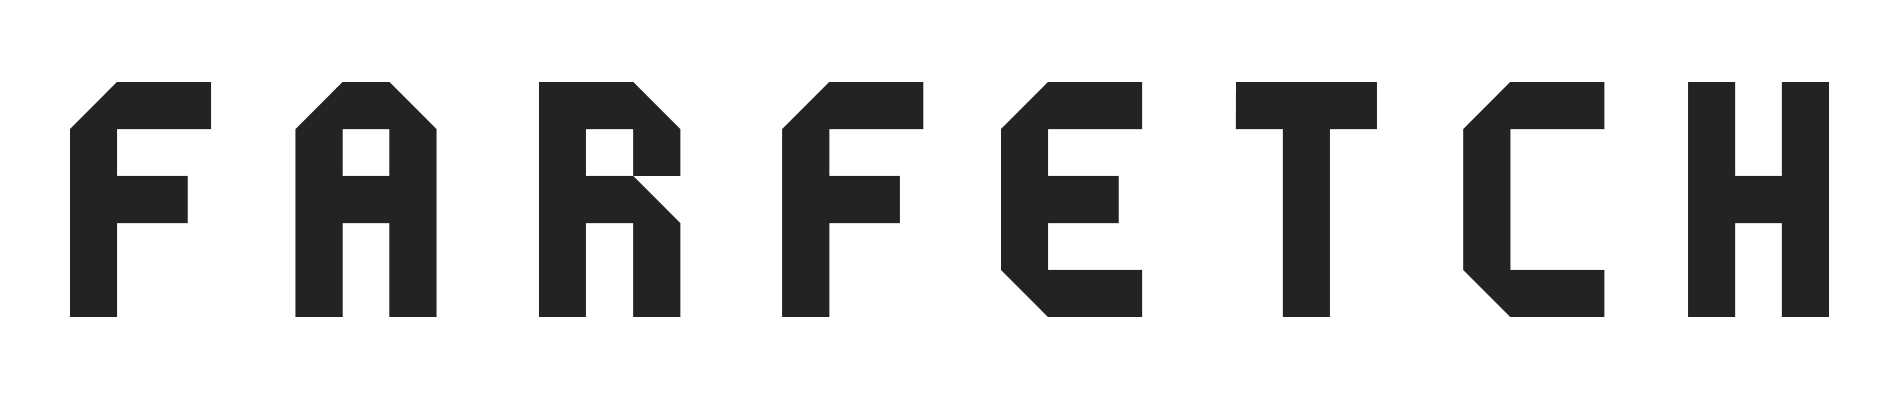 【Farfetch中文网】新客首单用码9折优惠码